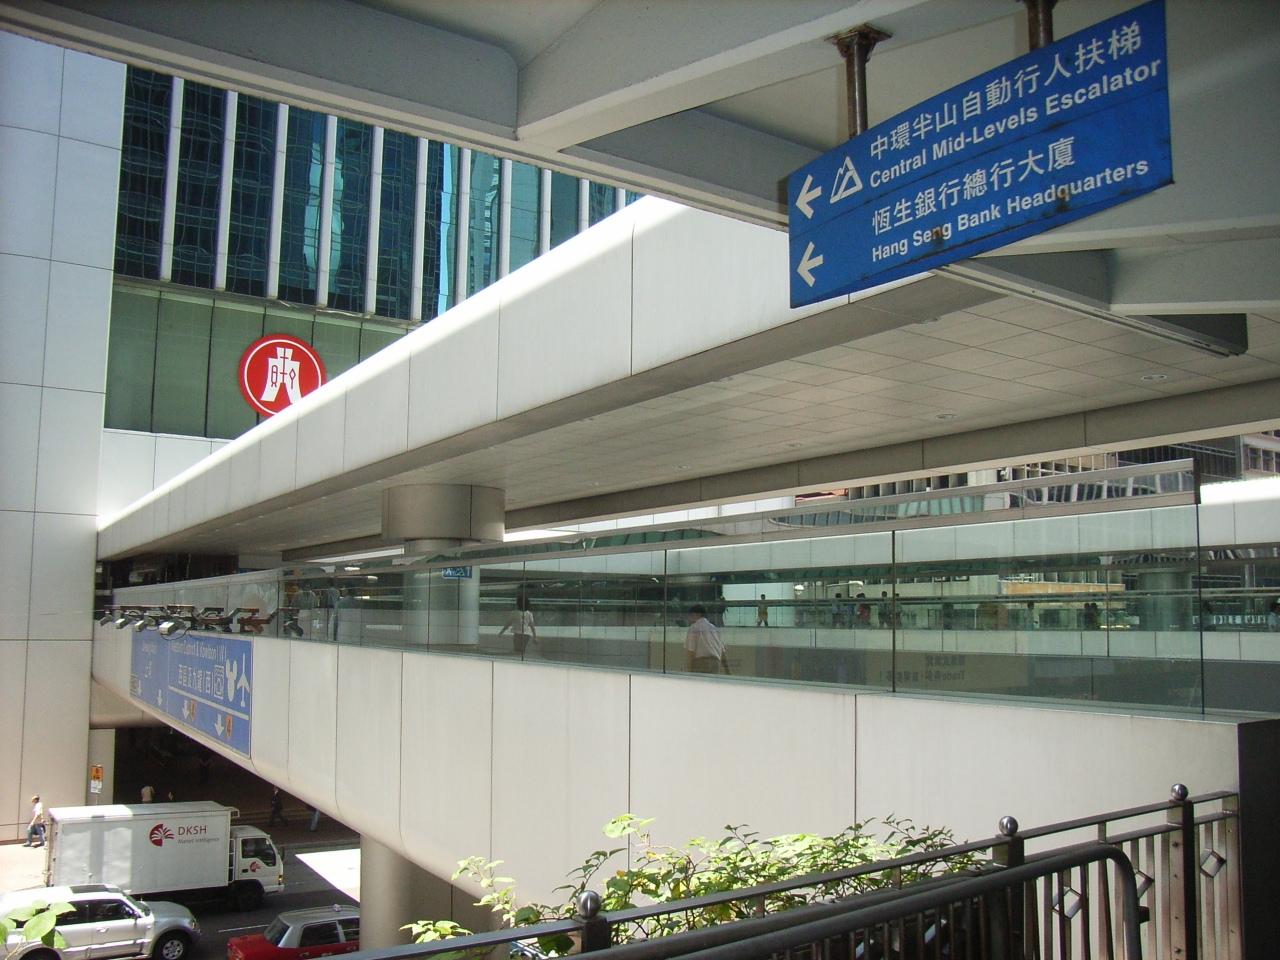 File:HK Hang Seng Bank Headquarters.JPG